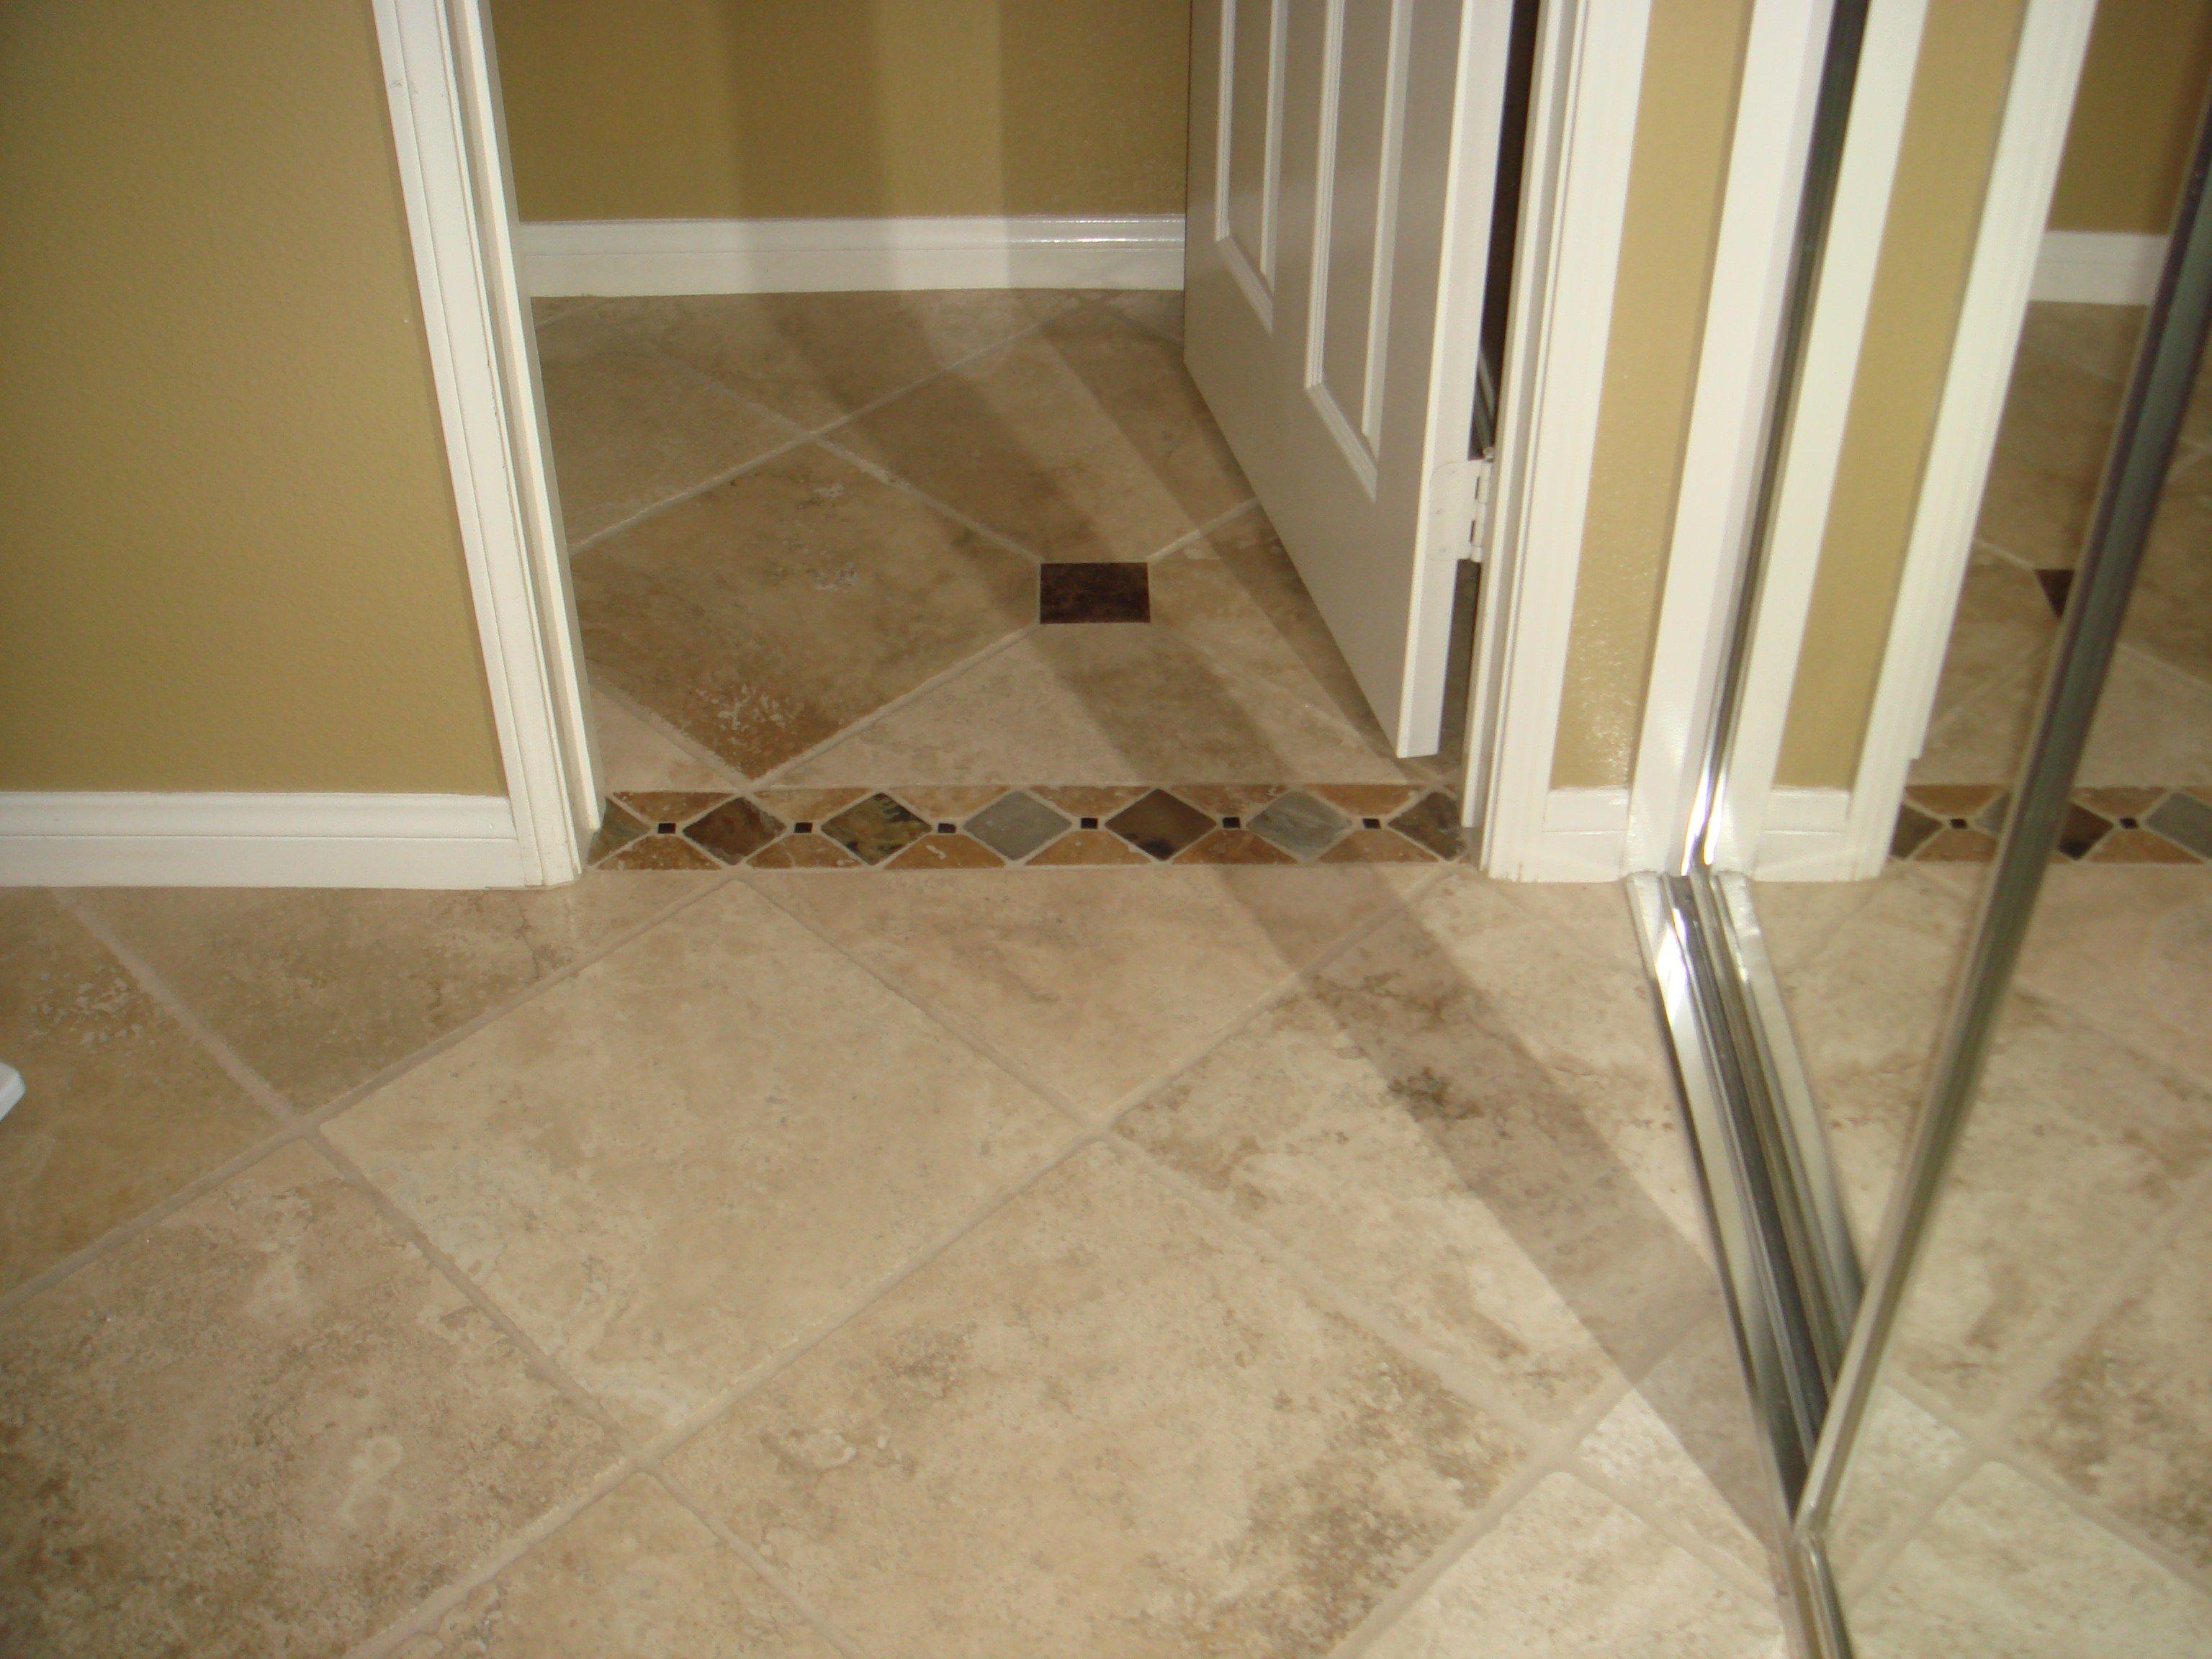 Ideas Tile Glazed Ceramic Tile Bathroom Tile Patterns Tile Ideas Bathroom Floor Tile I Patterned Bathroom Tiles Patterned Floor Tiles Bathroom Flooring Options